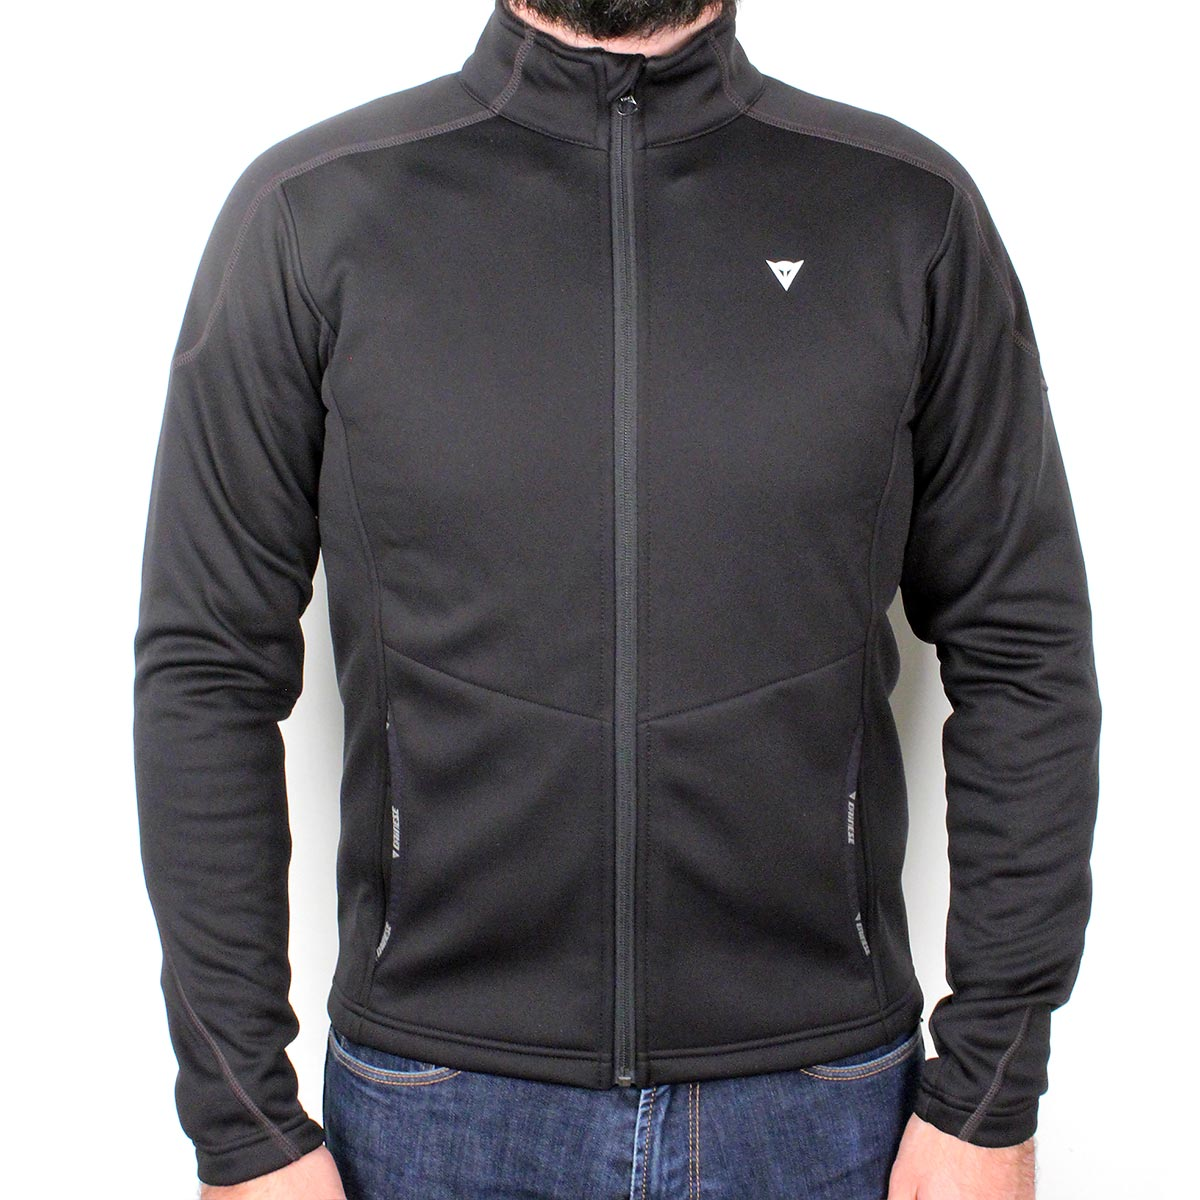 softshell dainese no wind layer d1 blouson sportswear japauto accessoires. Black Bedroom Furniture Sets. Home Design Ideas